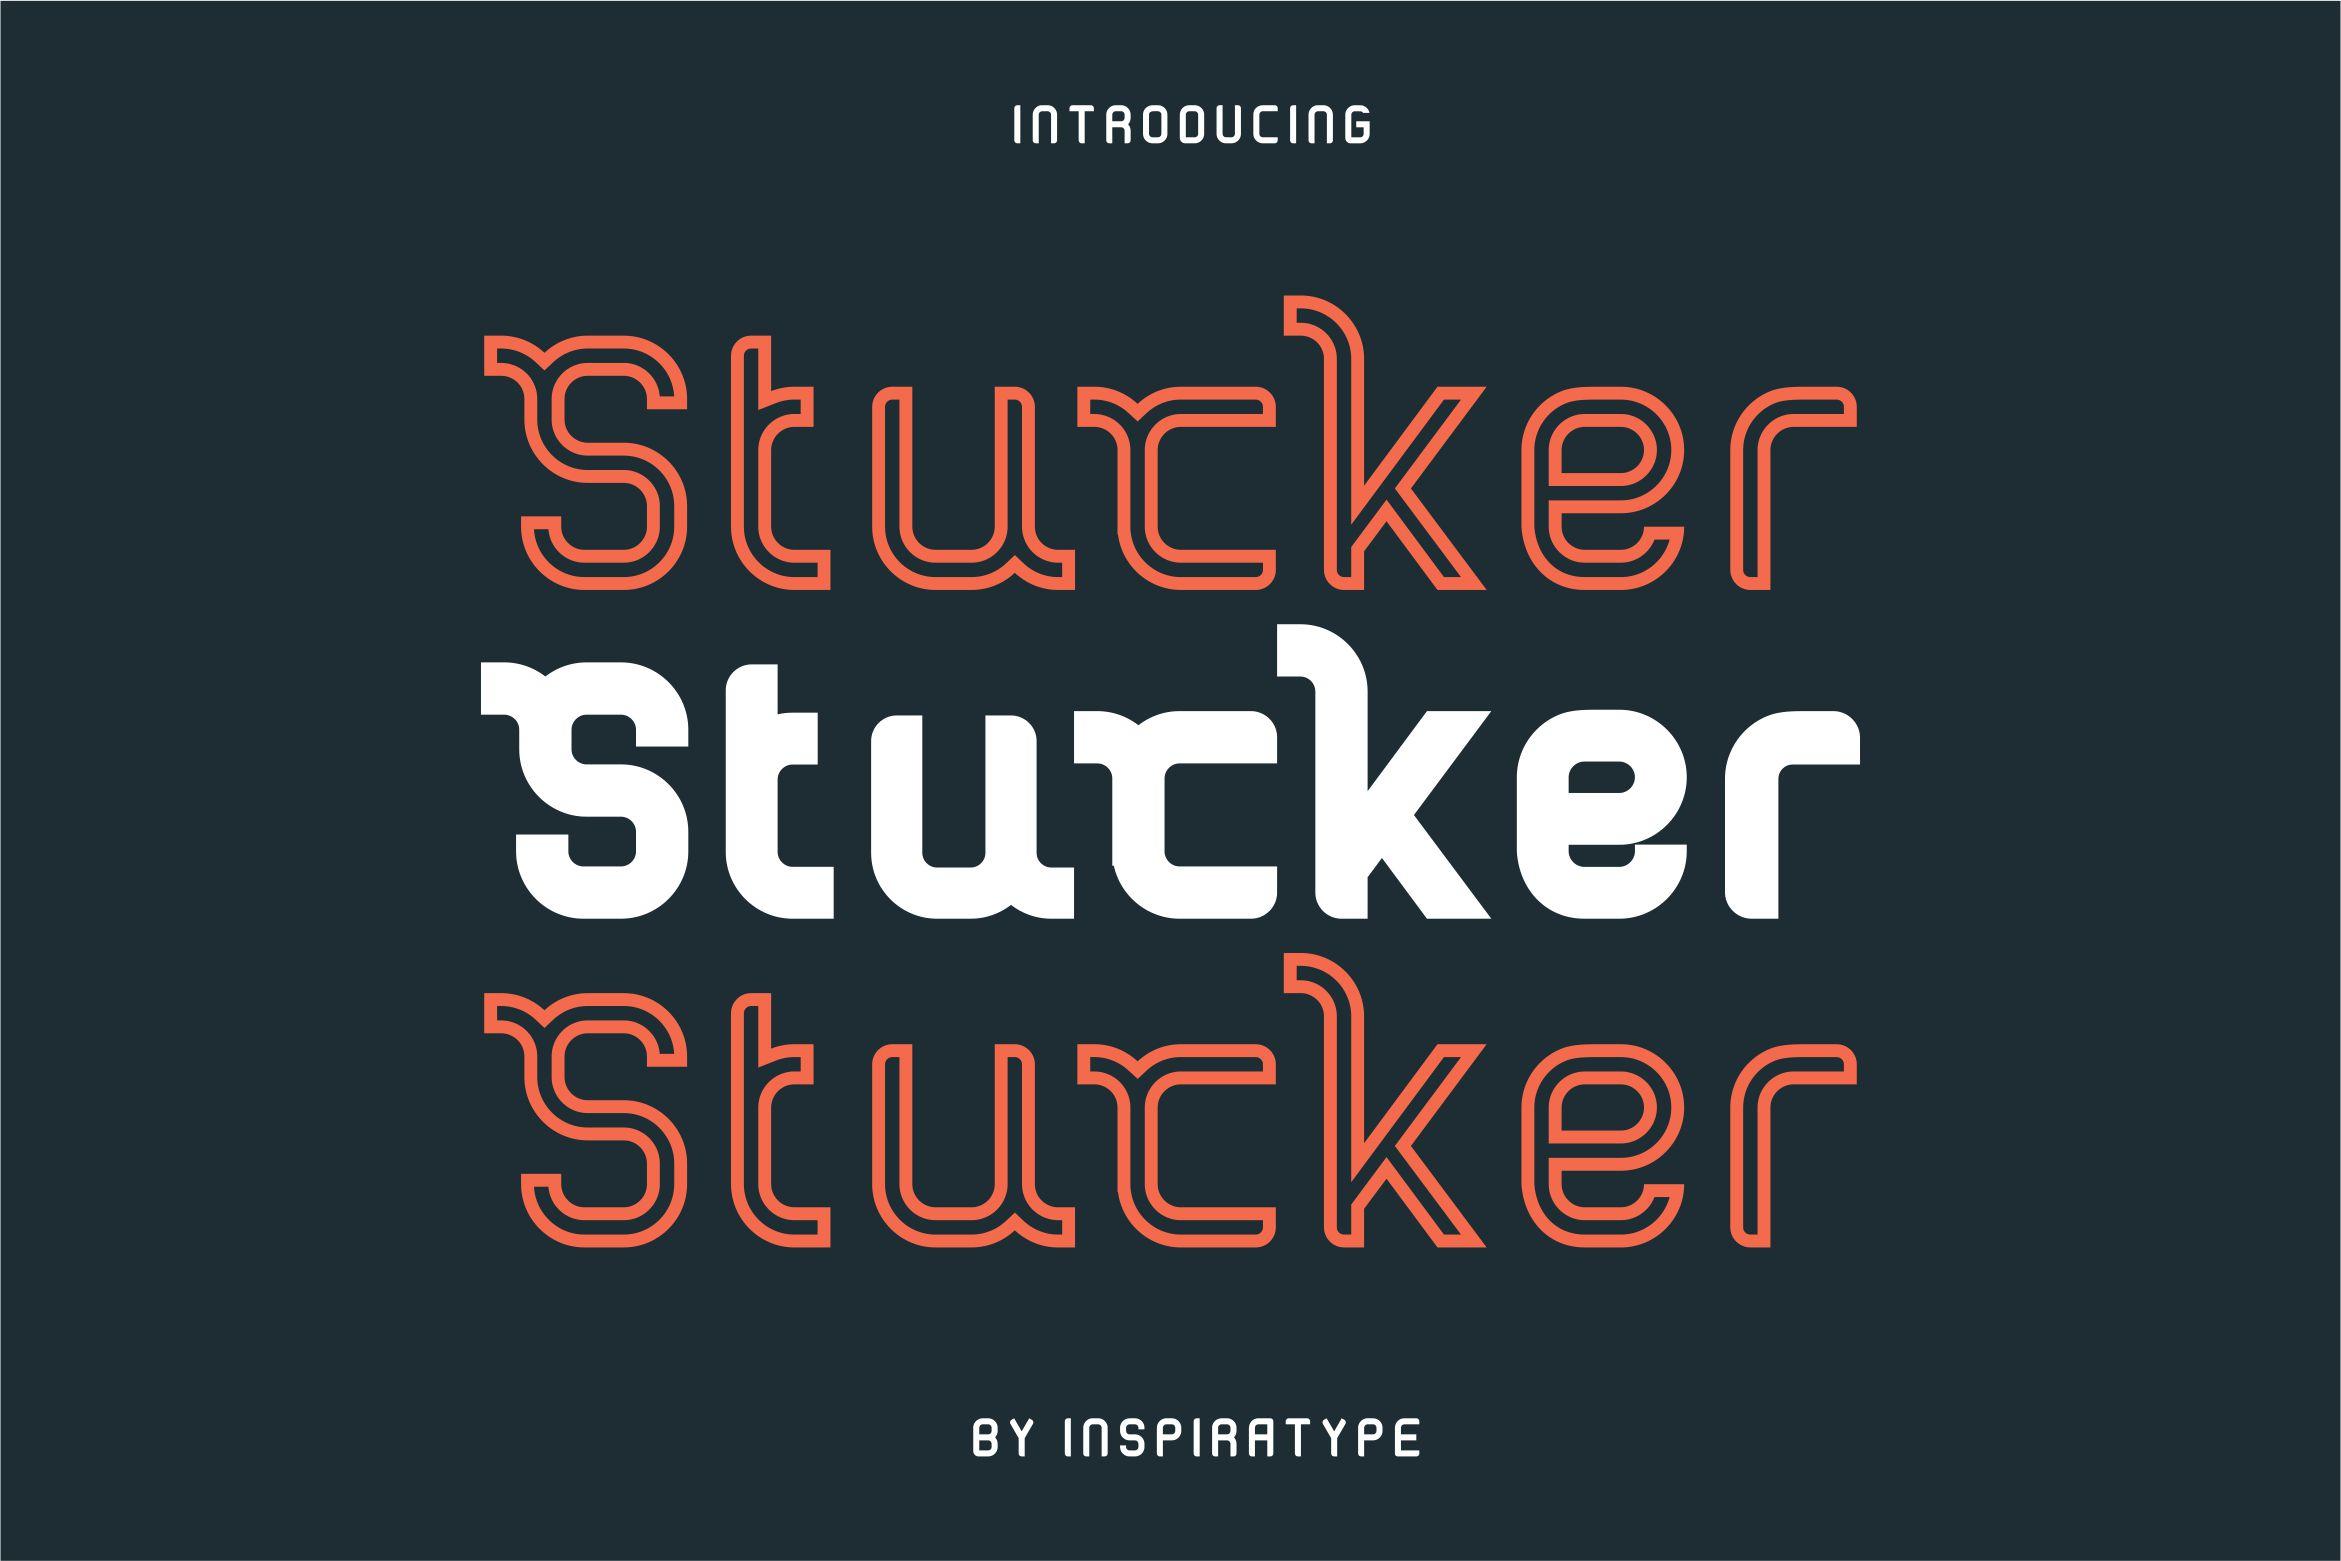 Stucker - Regular, Bold & Inline example image 1